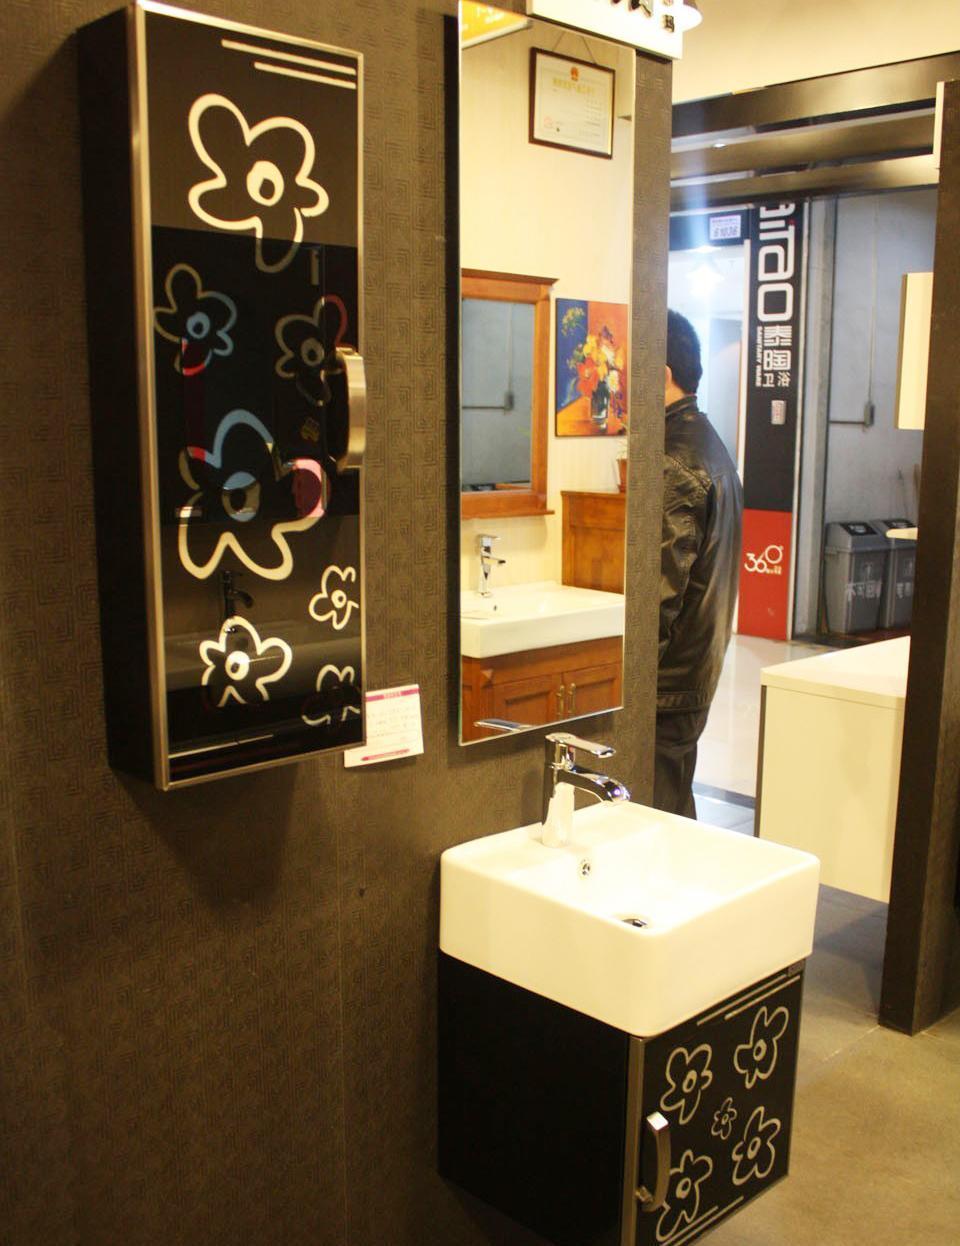 席玛BN-810浴室柜BN-810